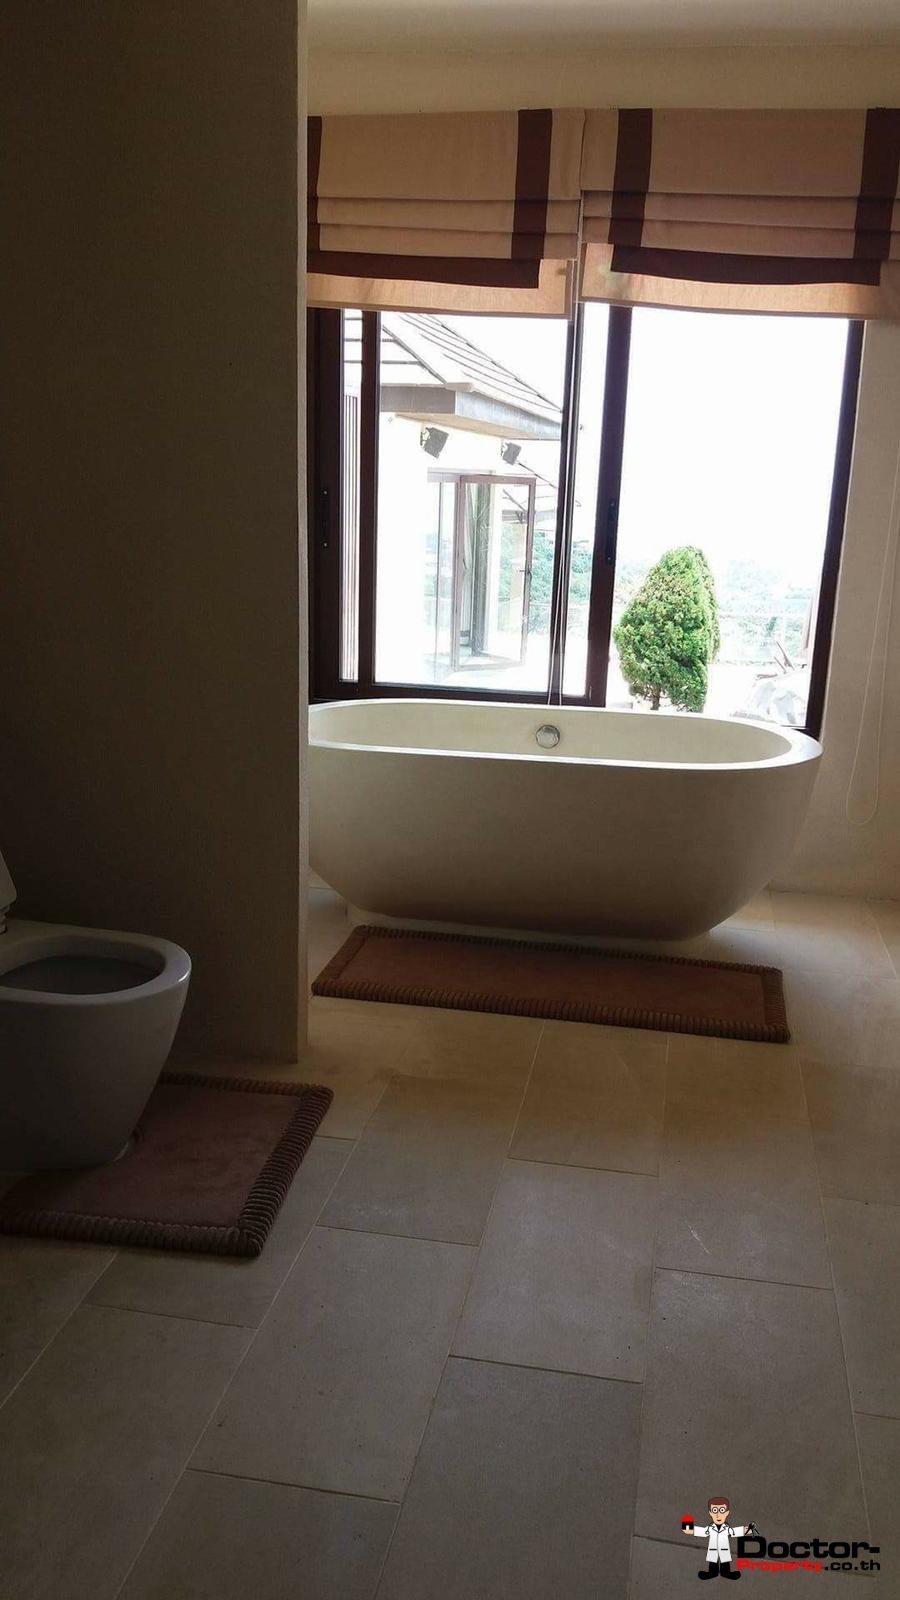 6 Bedroom Villa with Sea View - Bophut - Koh Samui - for sale 19